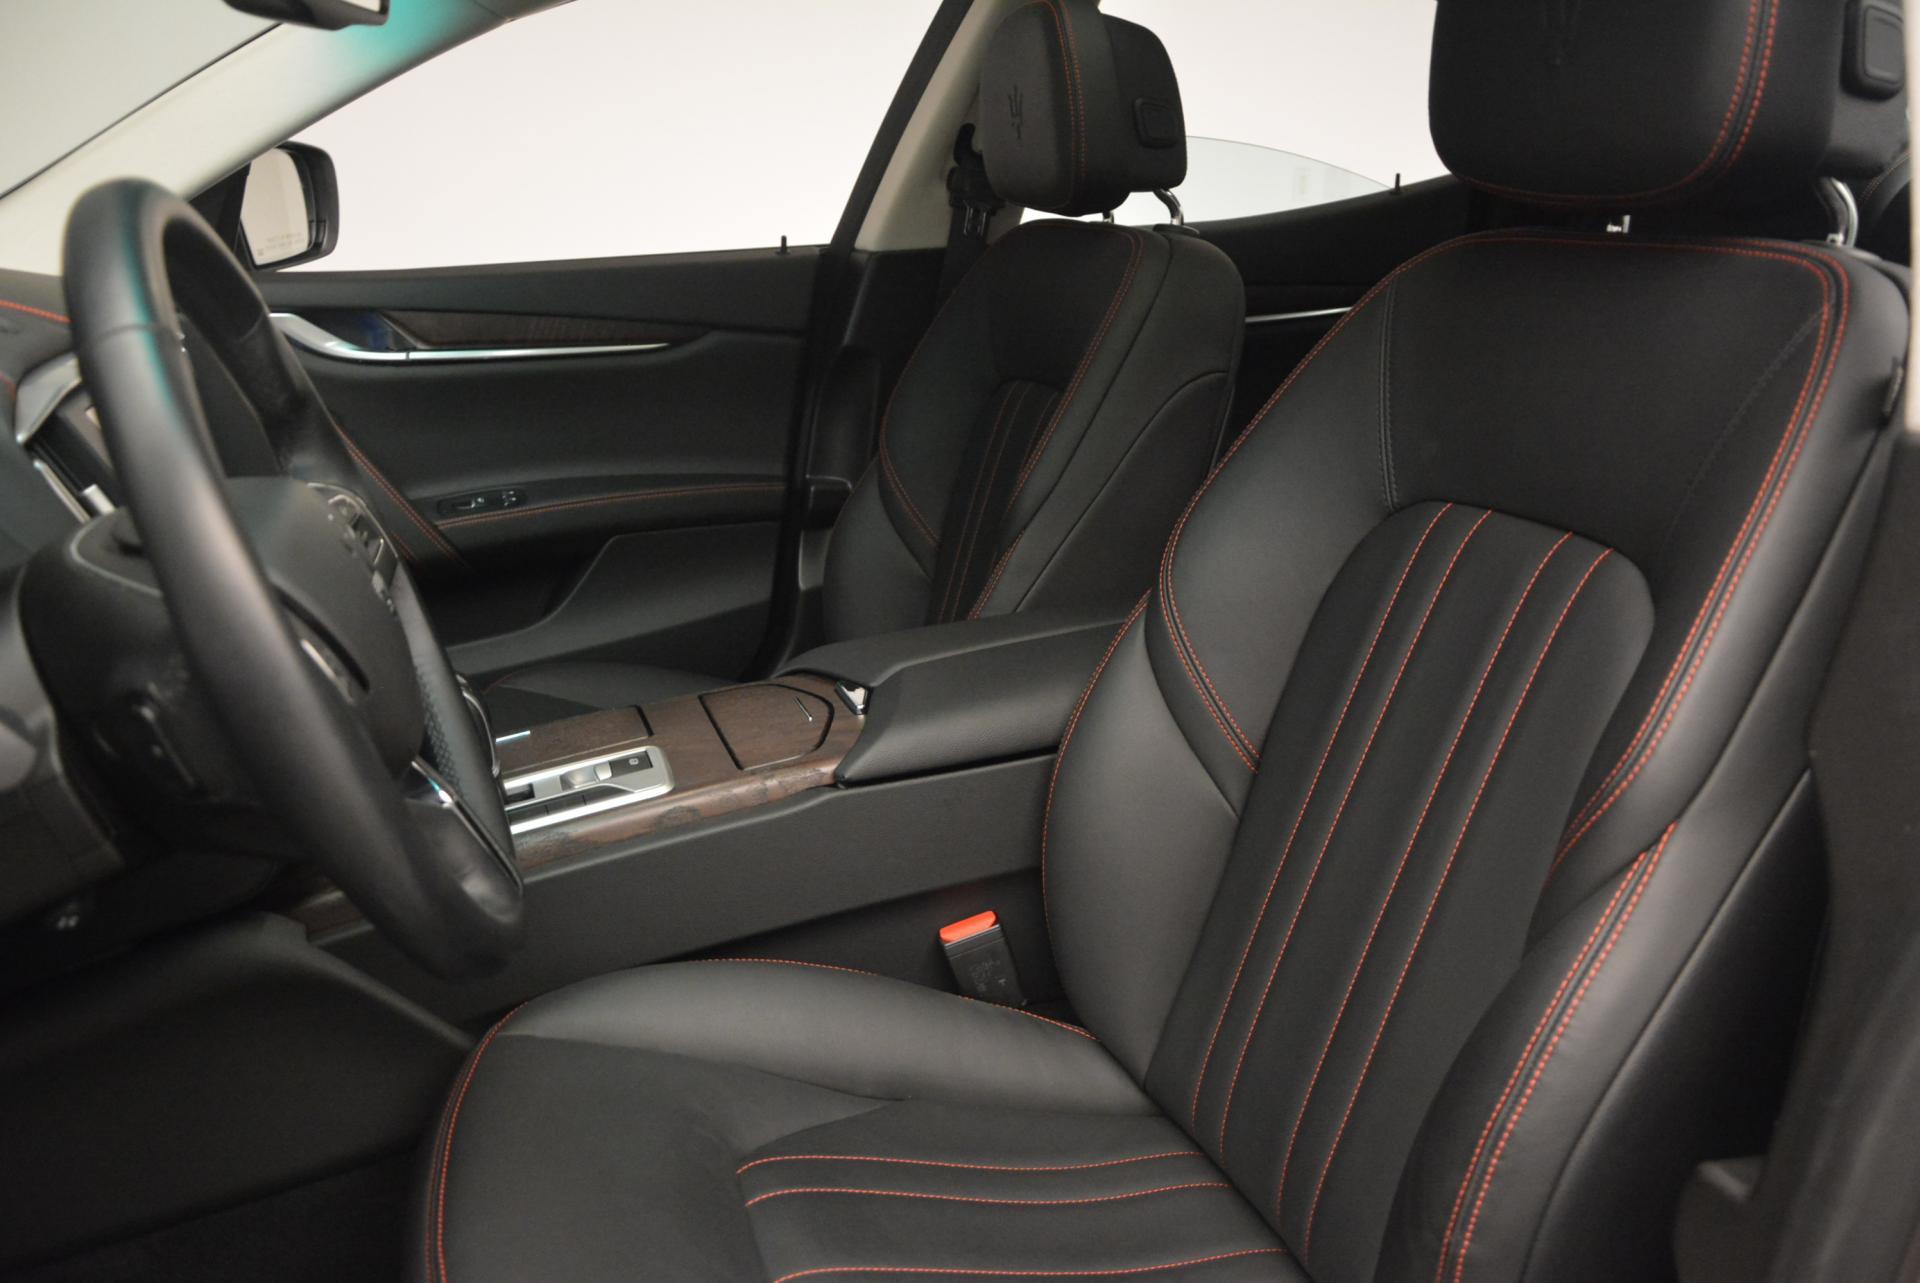 Used 2016 Maserati Ghibli S Q4 For Sale In Greenwich, CT 192_p24